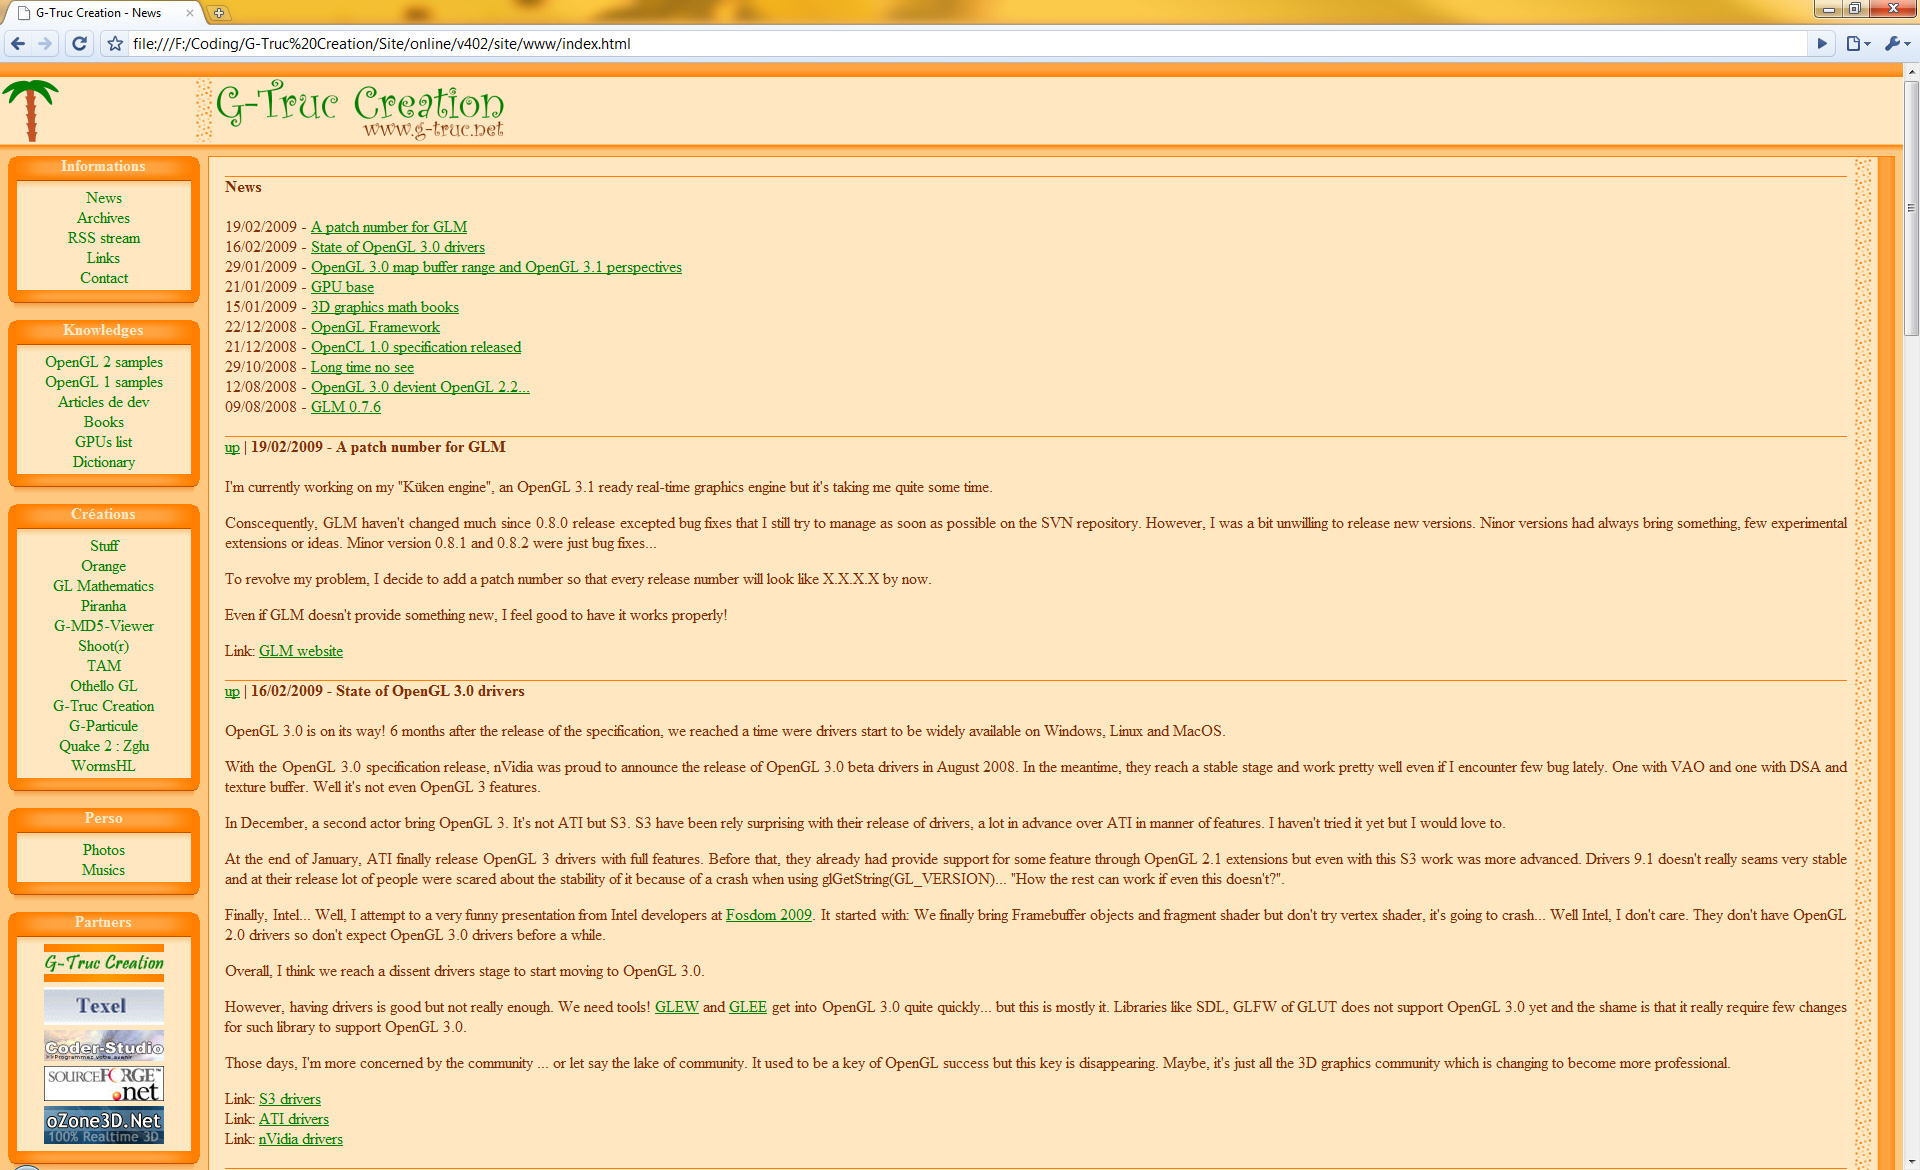 G-Truc Creation Website